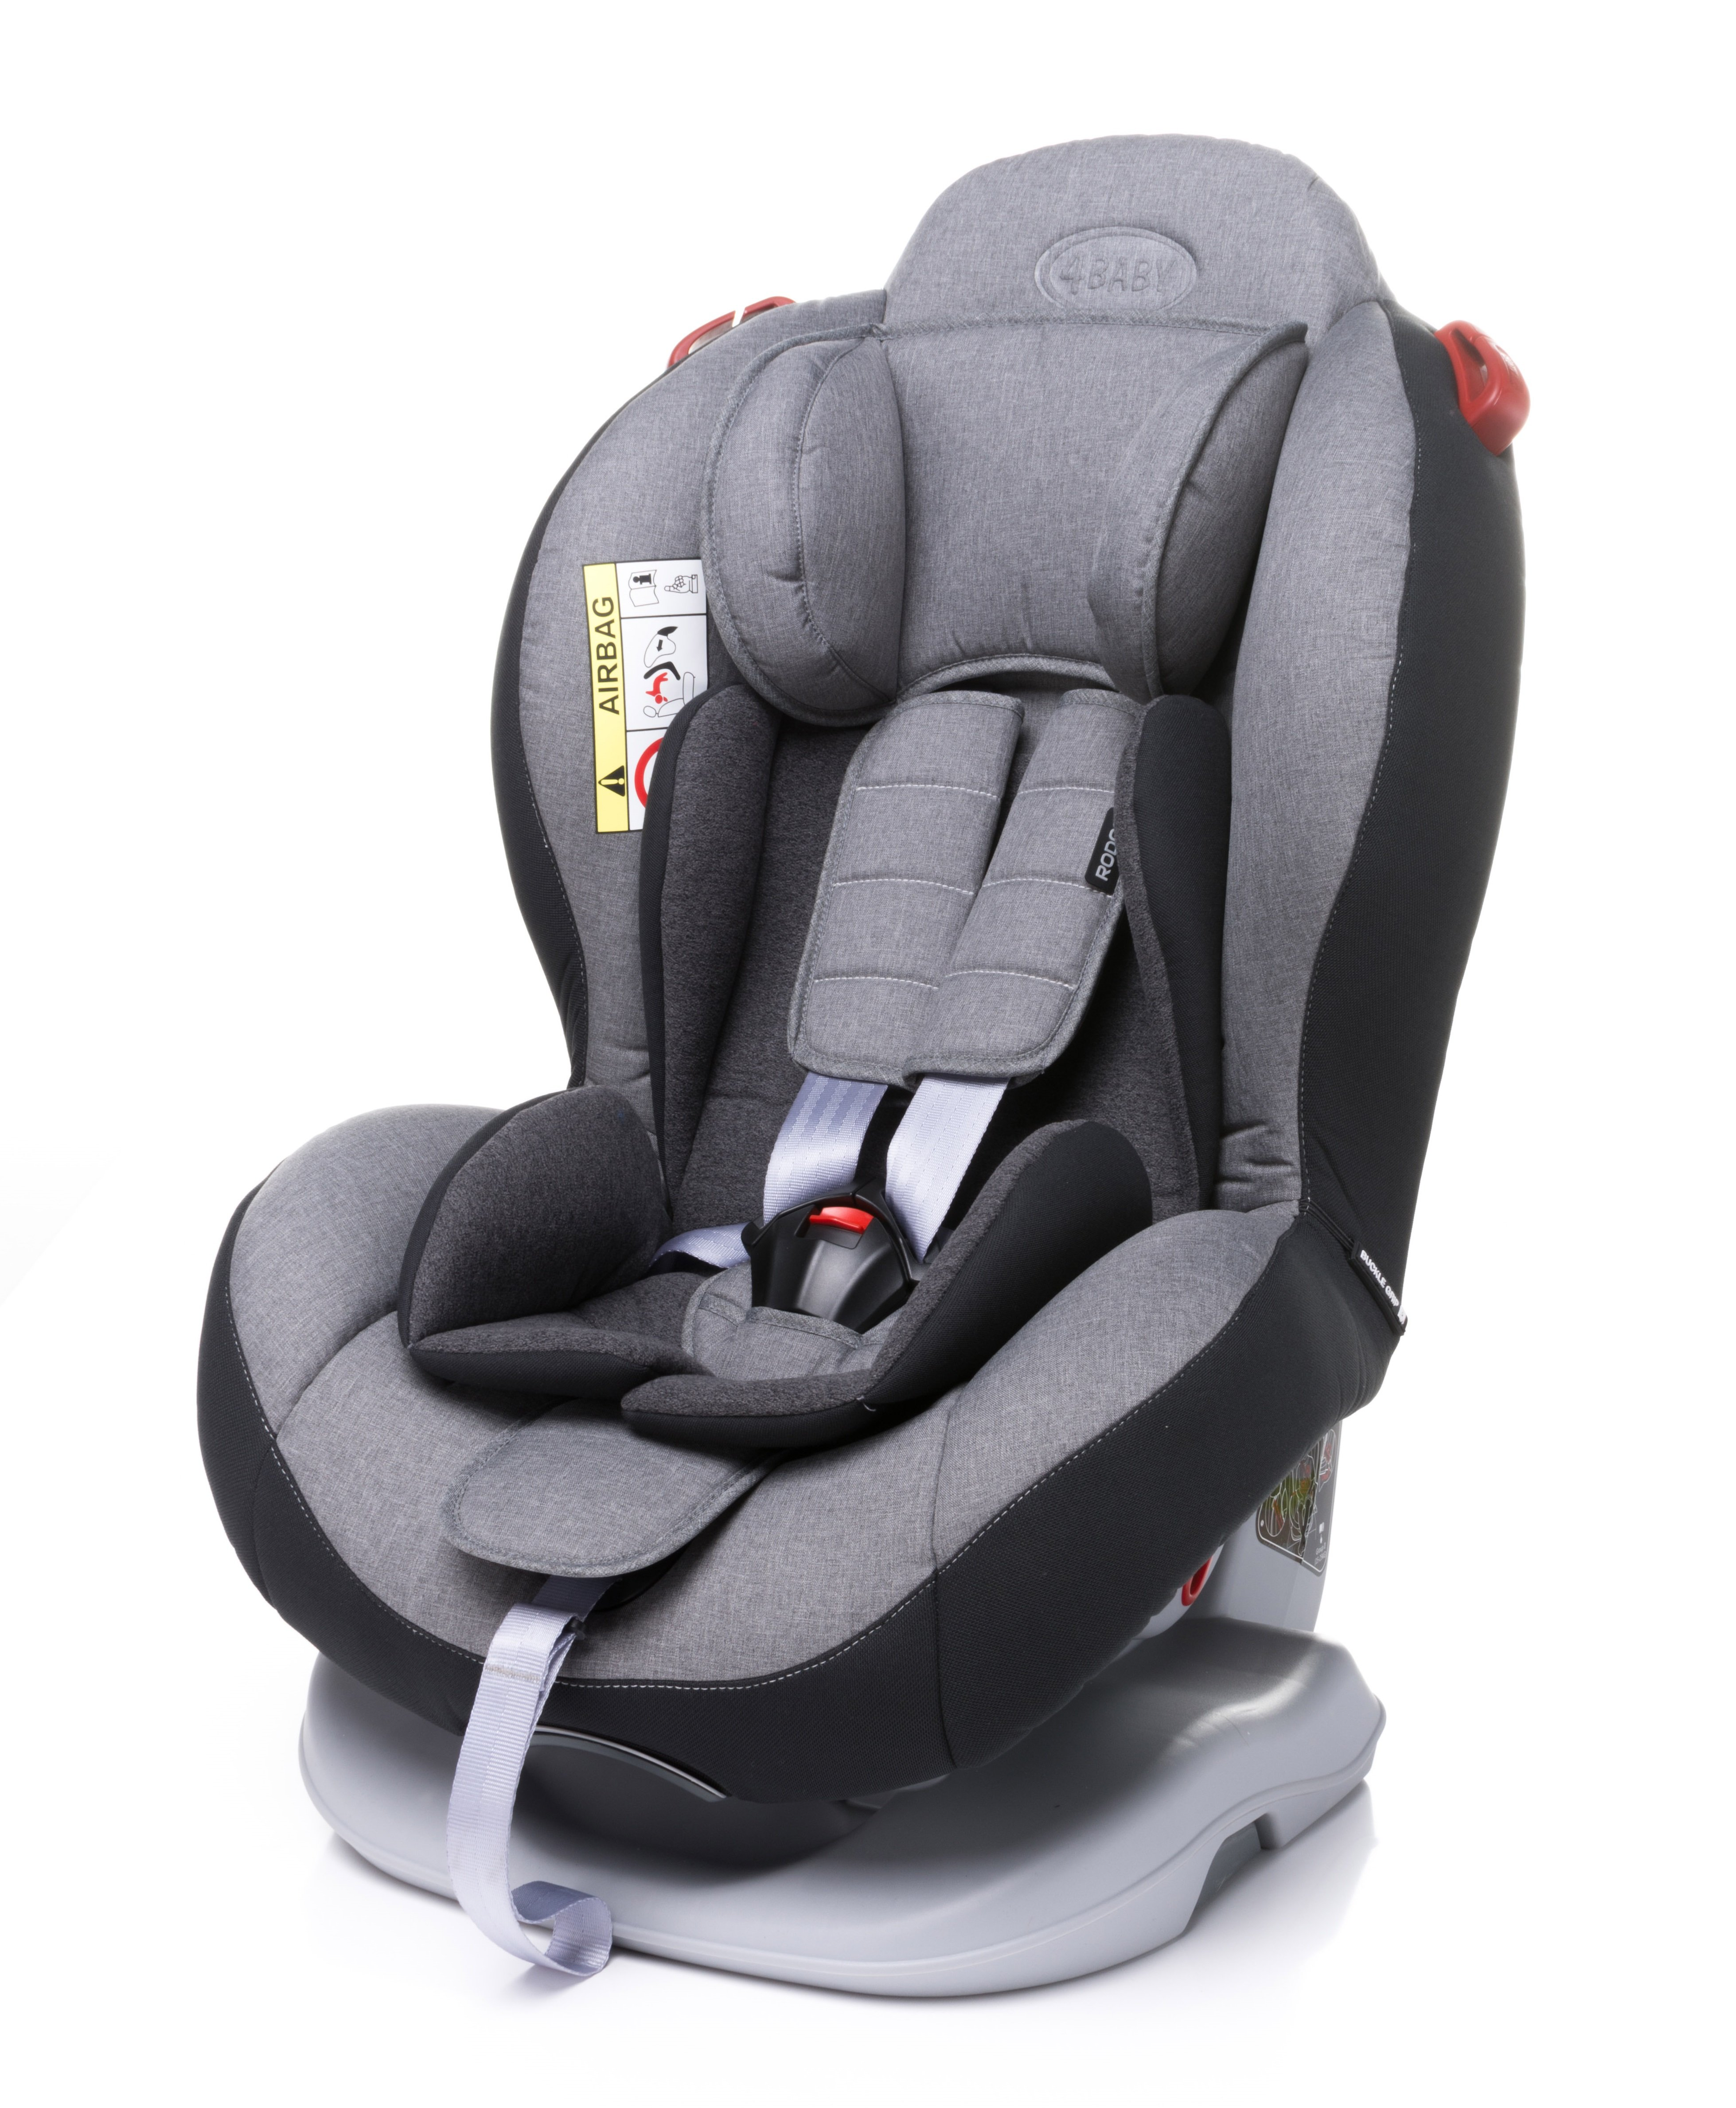 Bērnu autosēdeklis 0-25 kg 4BABY RODOS light grey